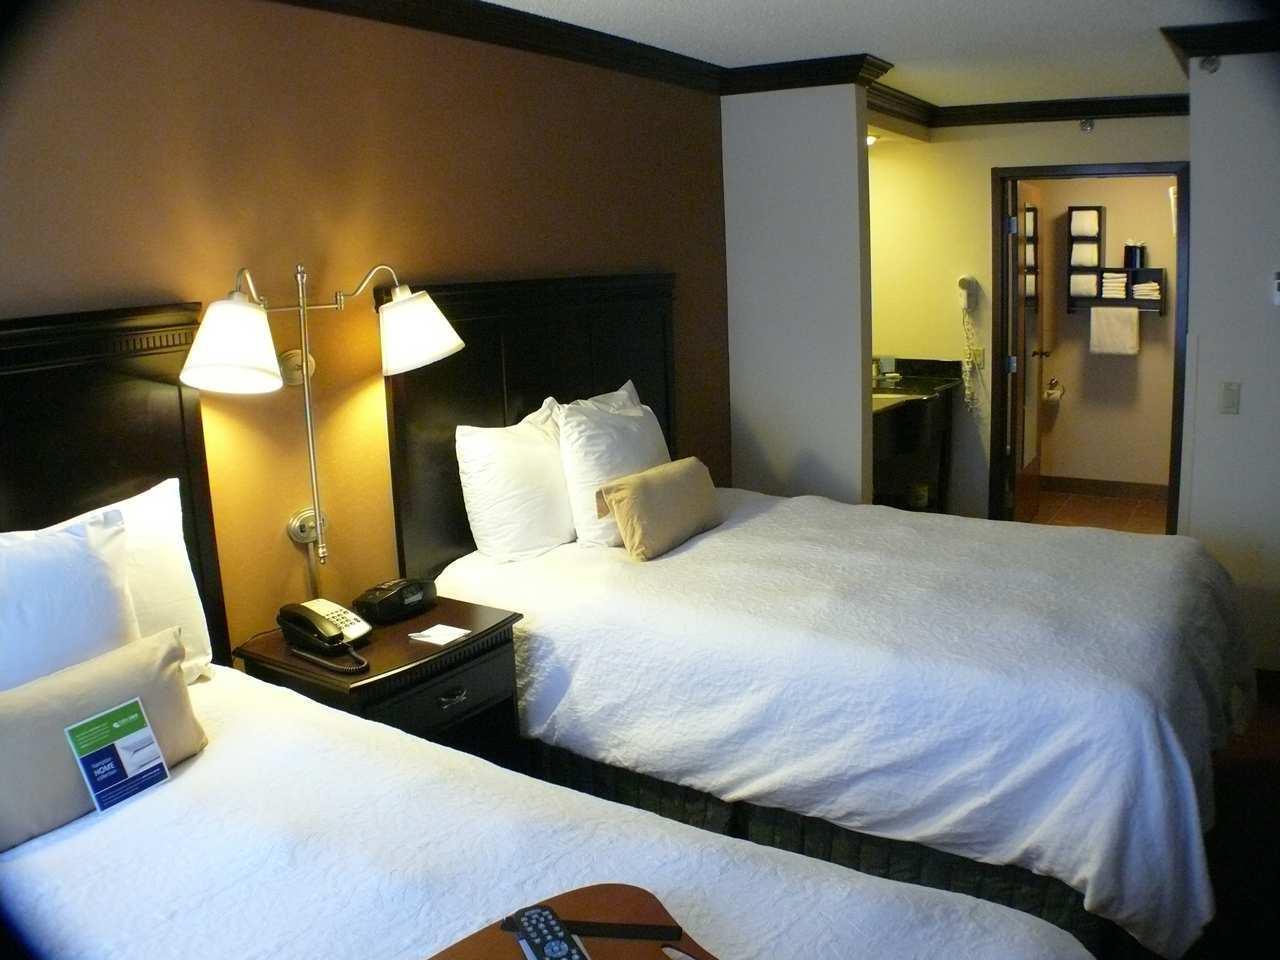 Hampton Inn & Suites Chicago/Hoffman Estates image 18